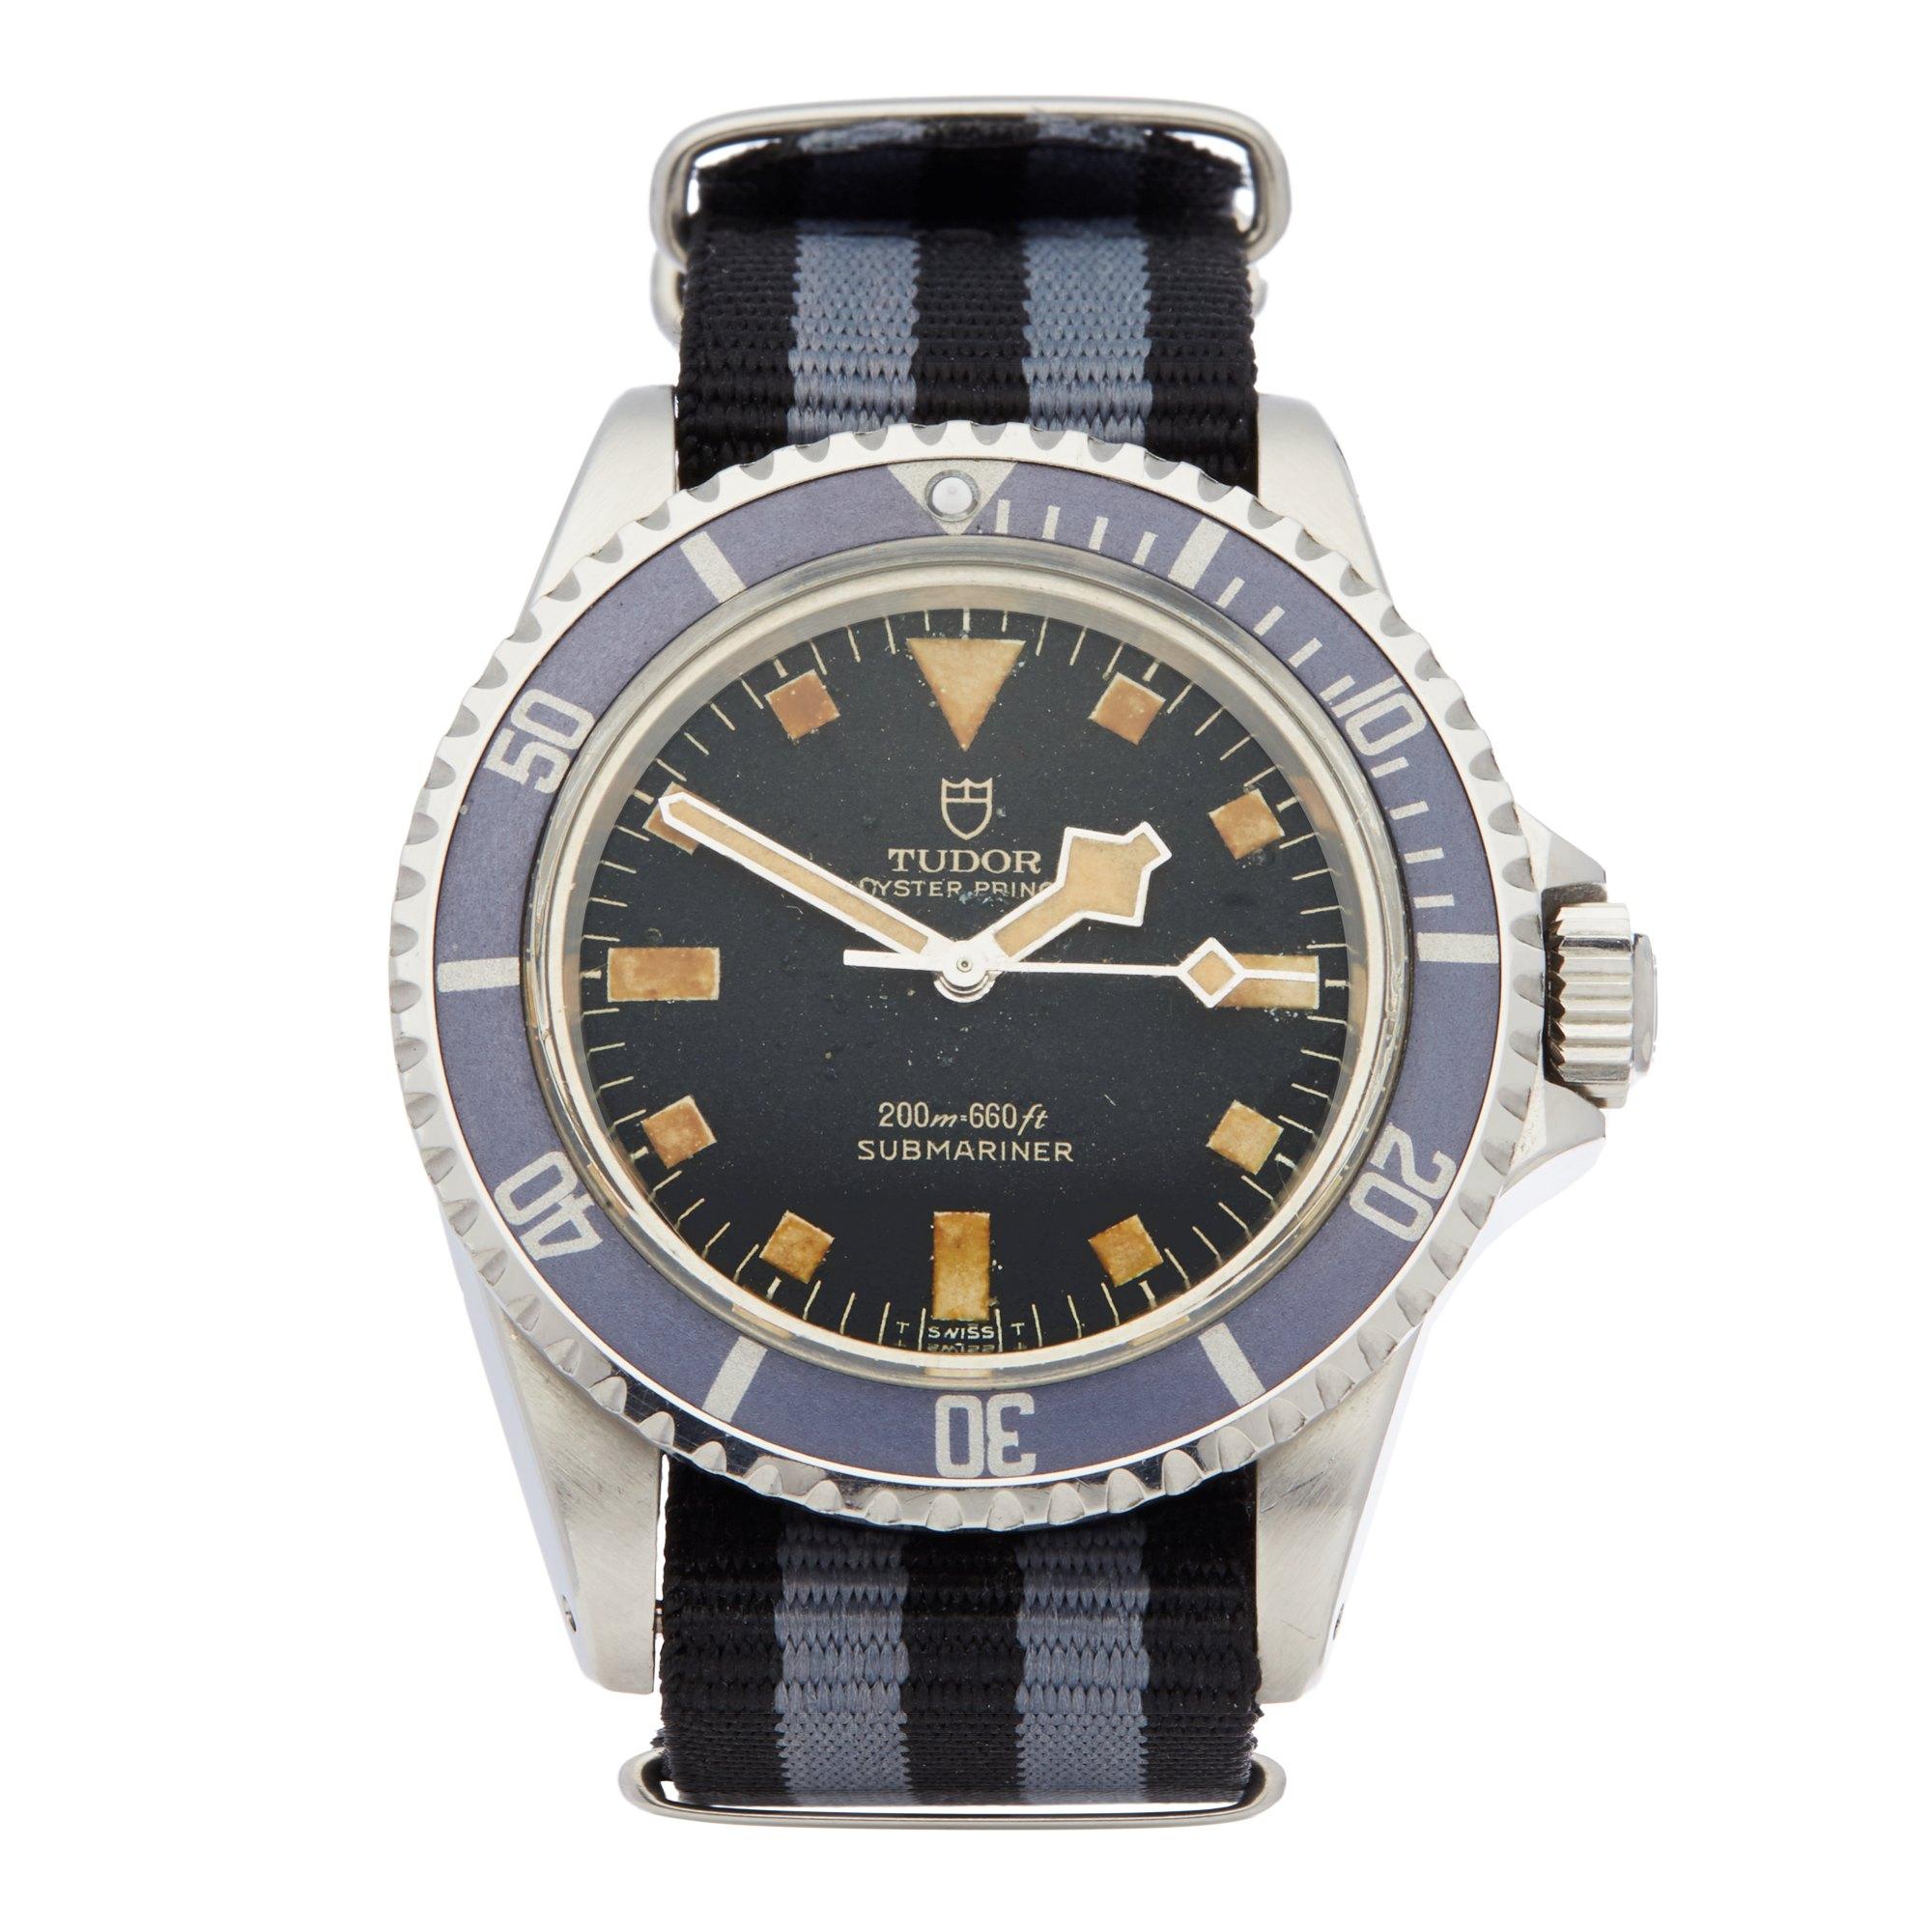 Tudor Submariner Gilt Snowflake Pcg Stainless Steel 7016